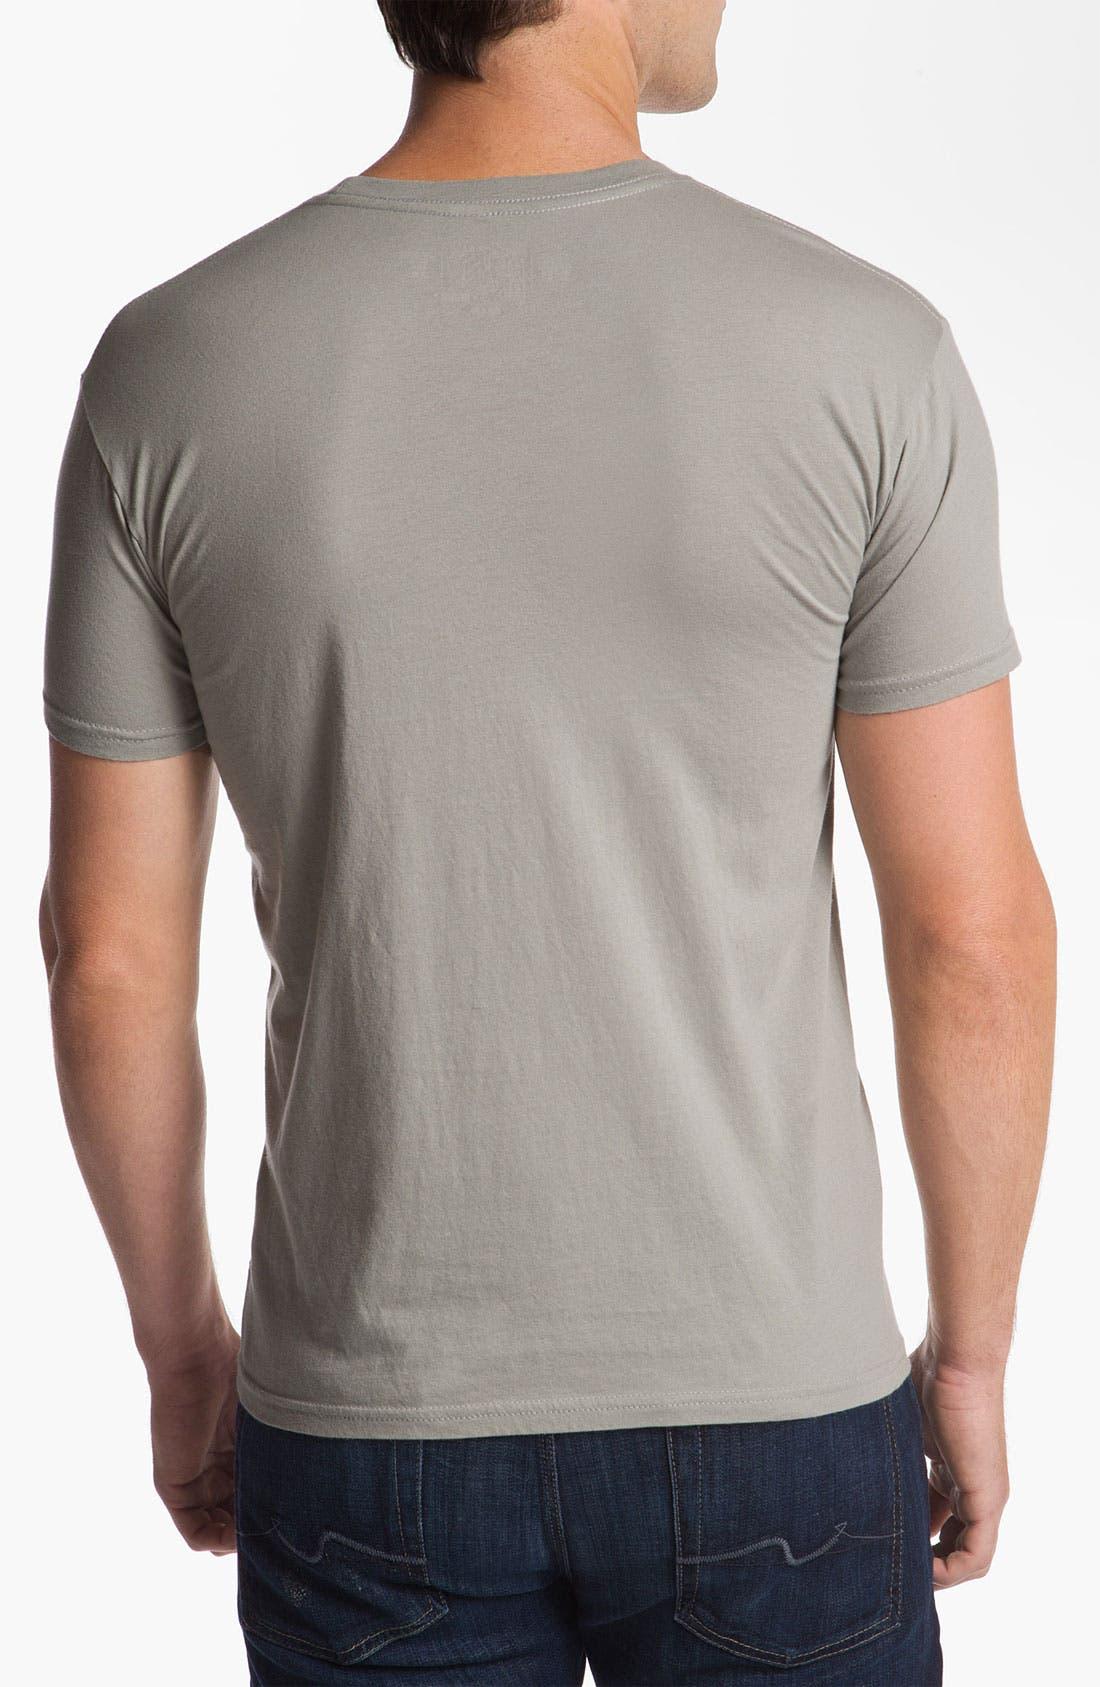 Alternate Image 2  - The Original Retro Brand 'Washington State Cougars' T-Shirt